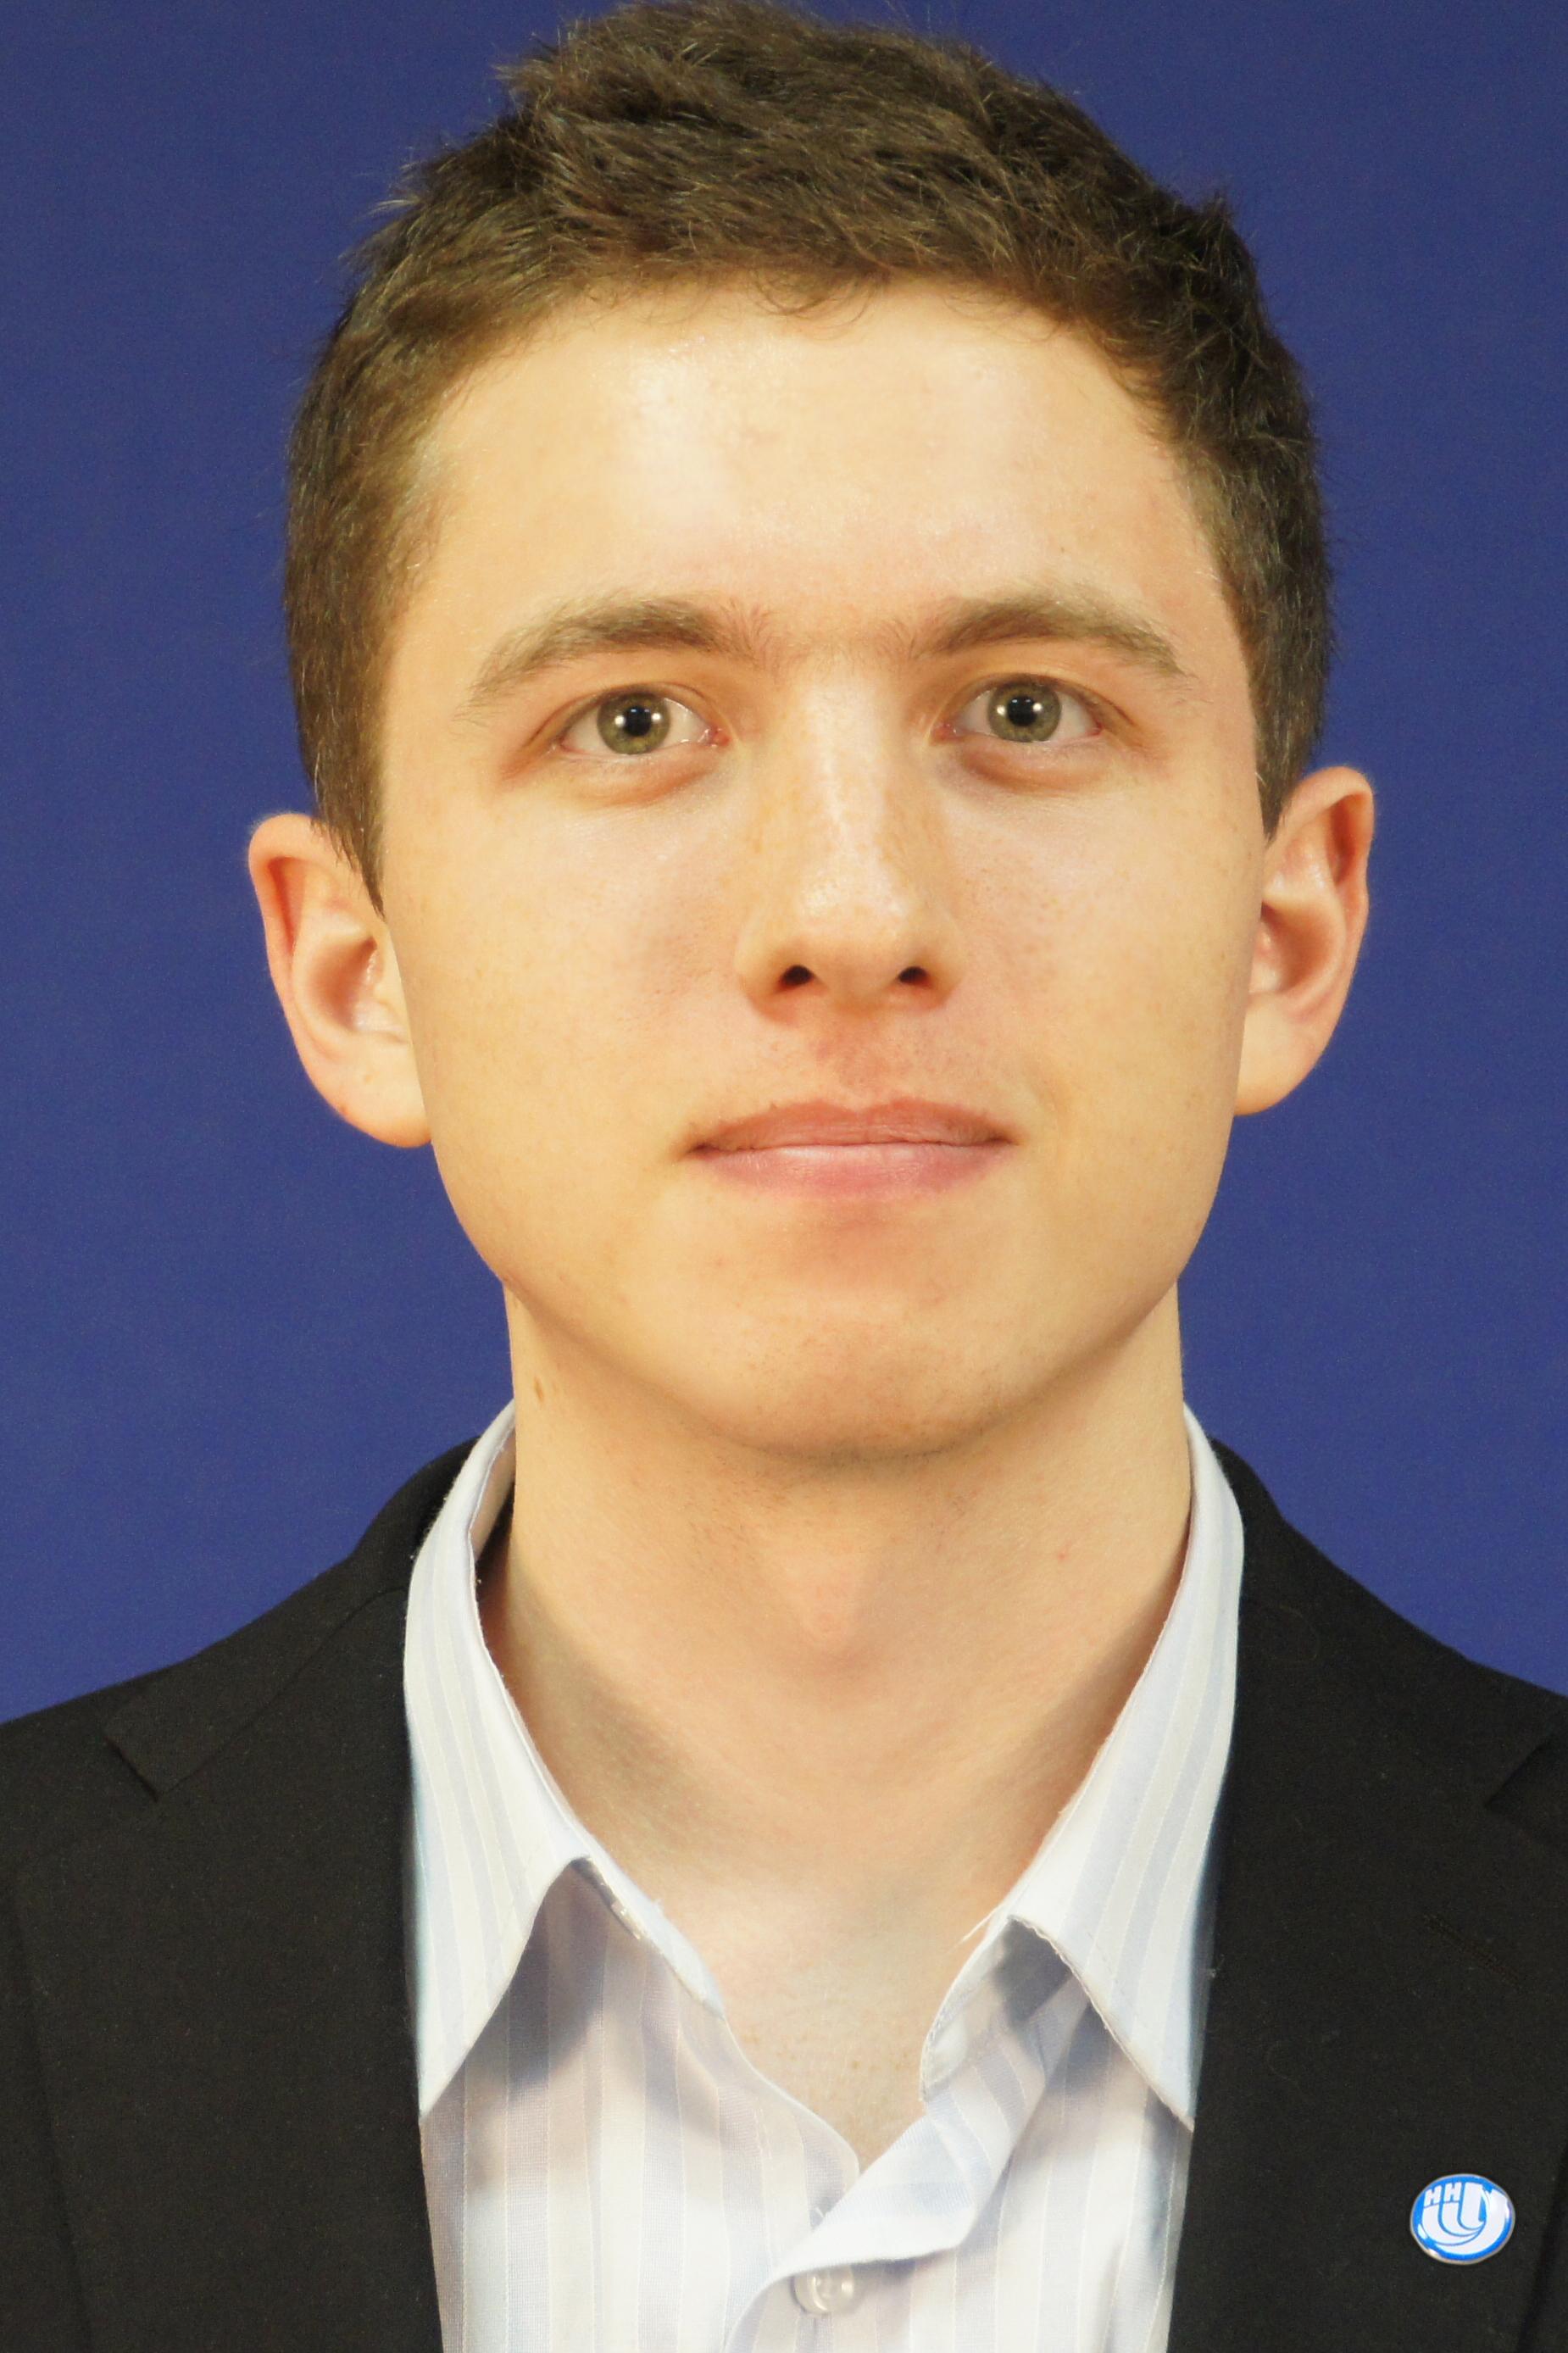 Додонов Владимир Алексеевич